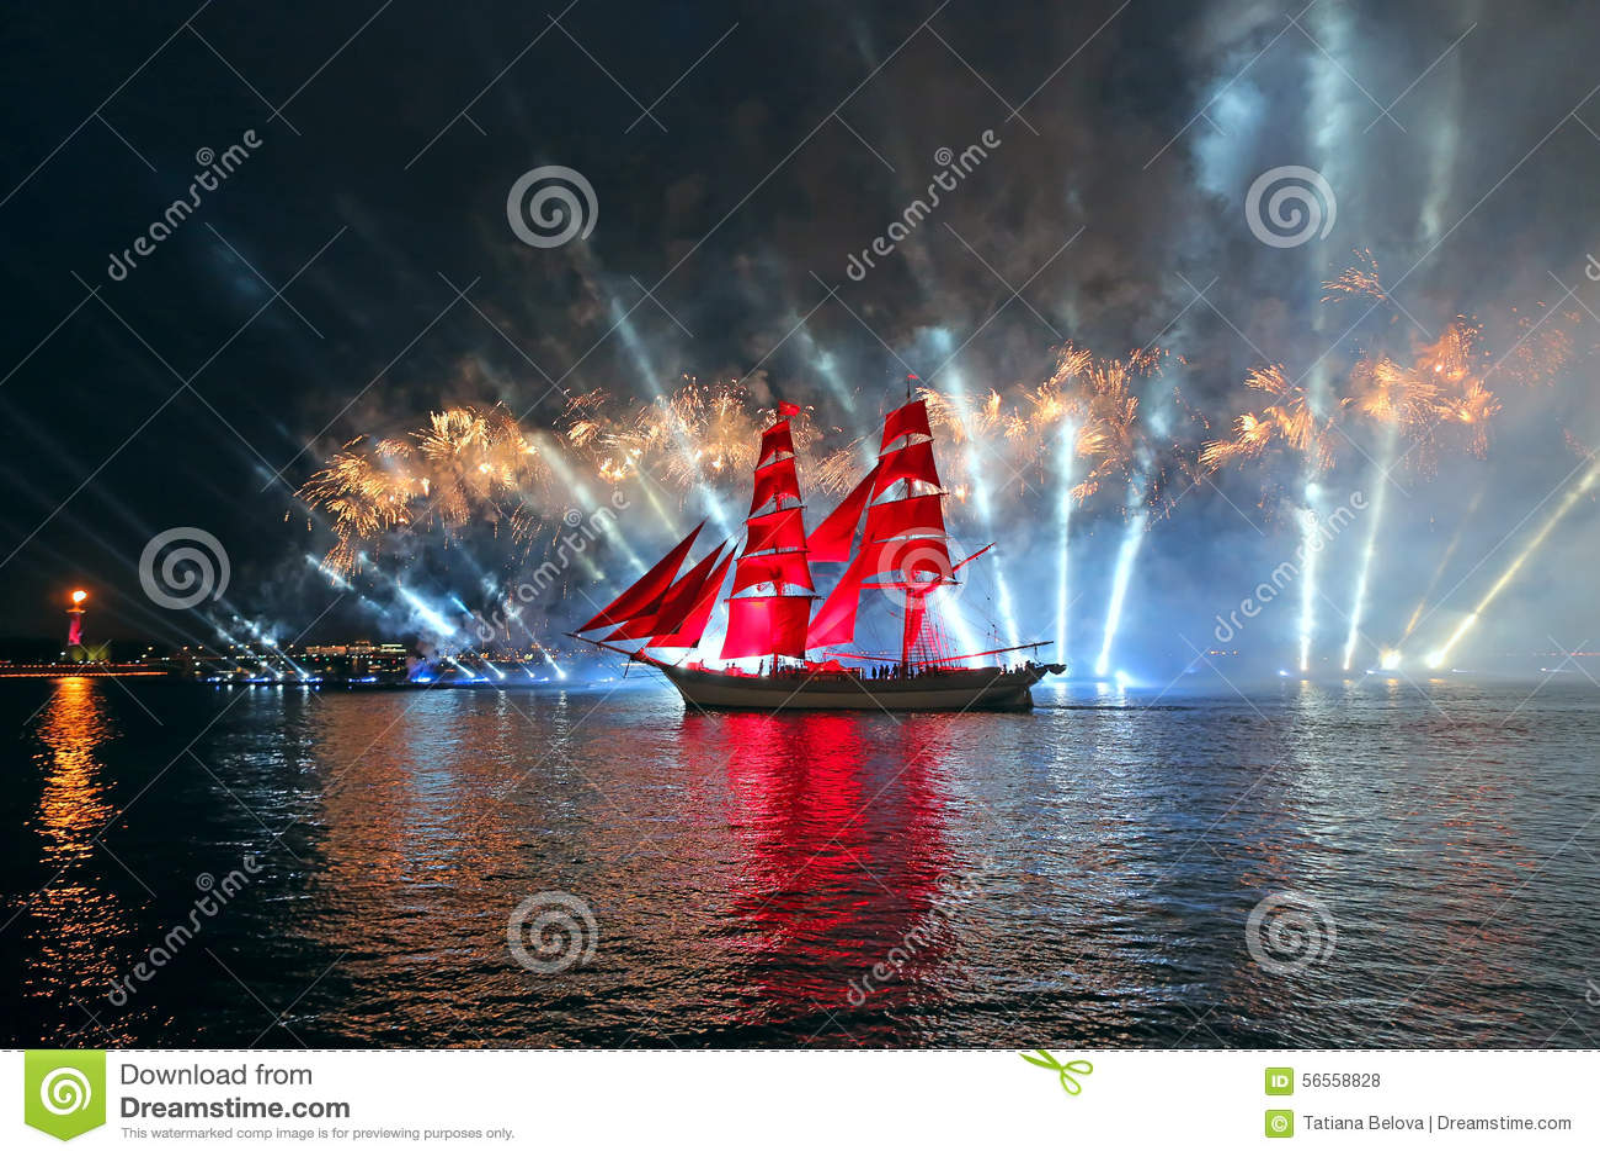 Download Τα ερυθρά πανιά εορτασμού παρουσιάζουν κατά τη διάρκεια του άσπρου φεστιβάλ νυχτών Εκδοτική Στοκ Εικόνες - εικόνα από νύχτα, πυρκαγιά: 56558828